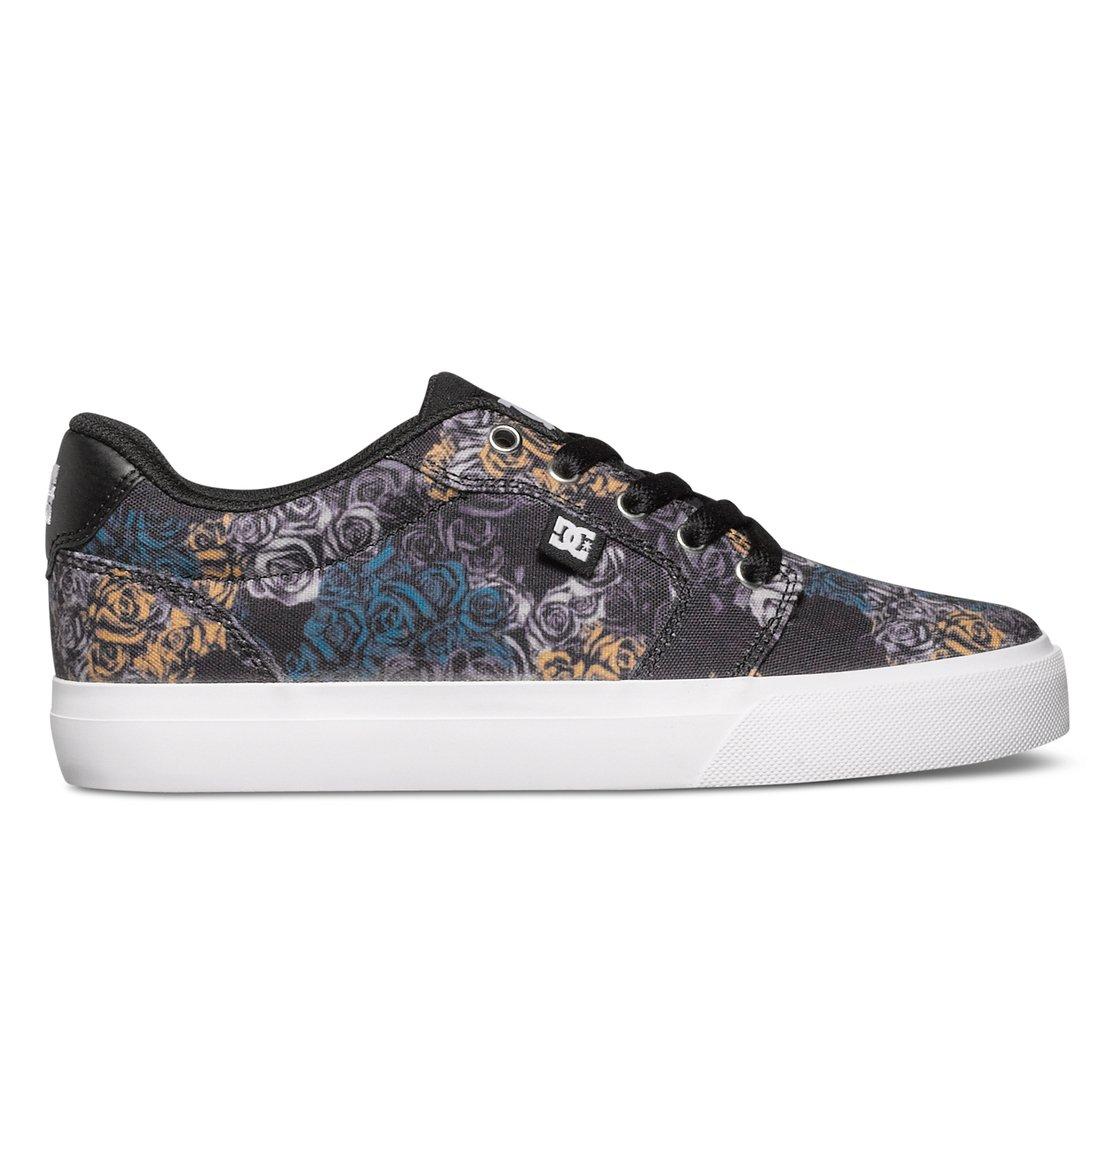 Anvil SP от DC Shoes